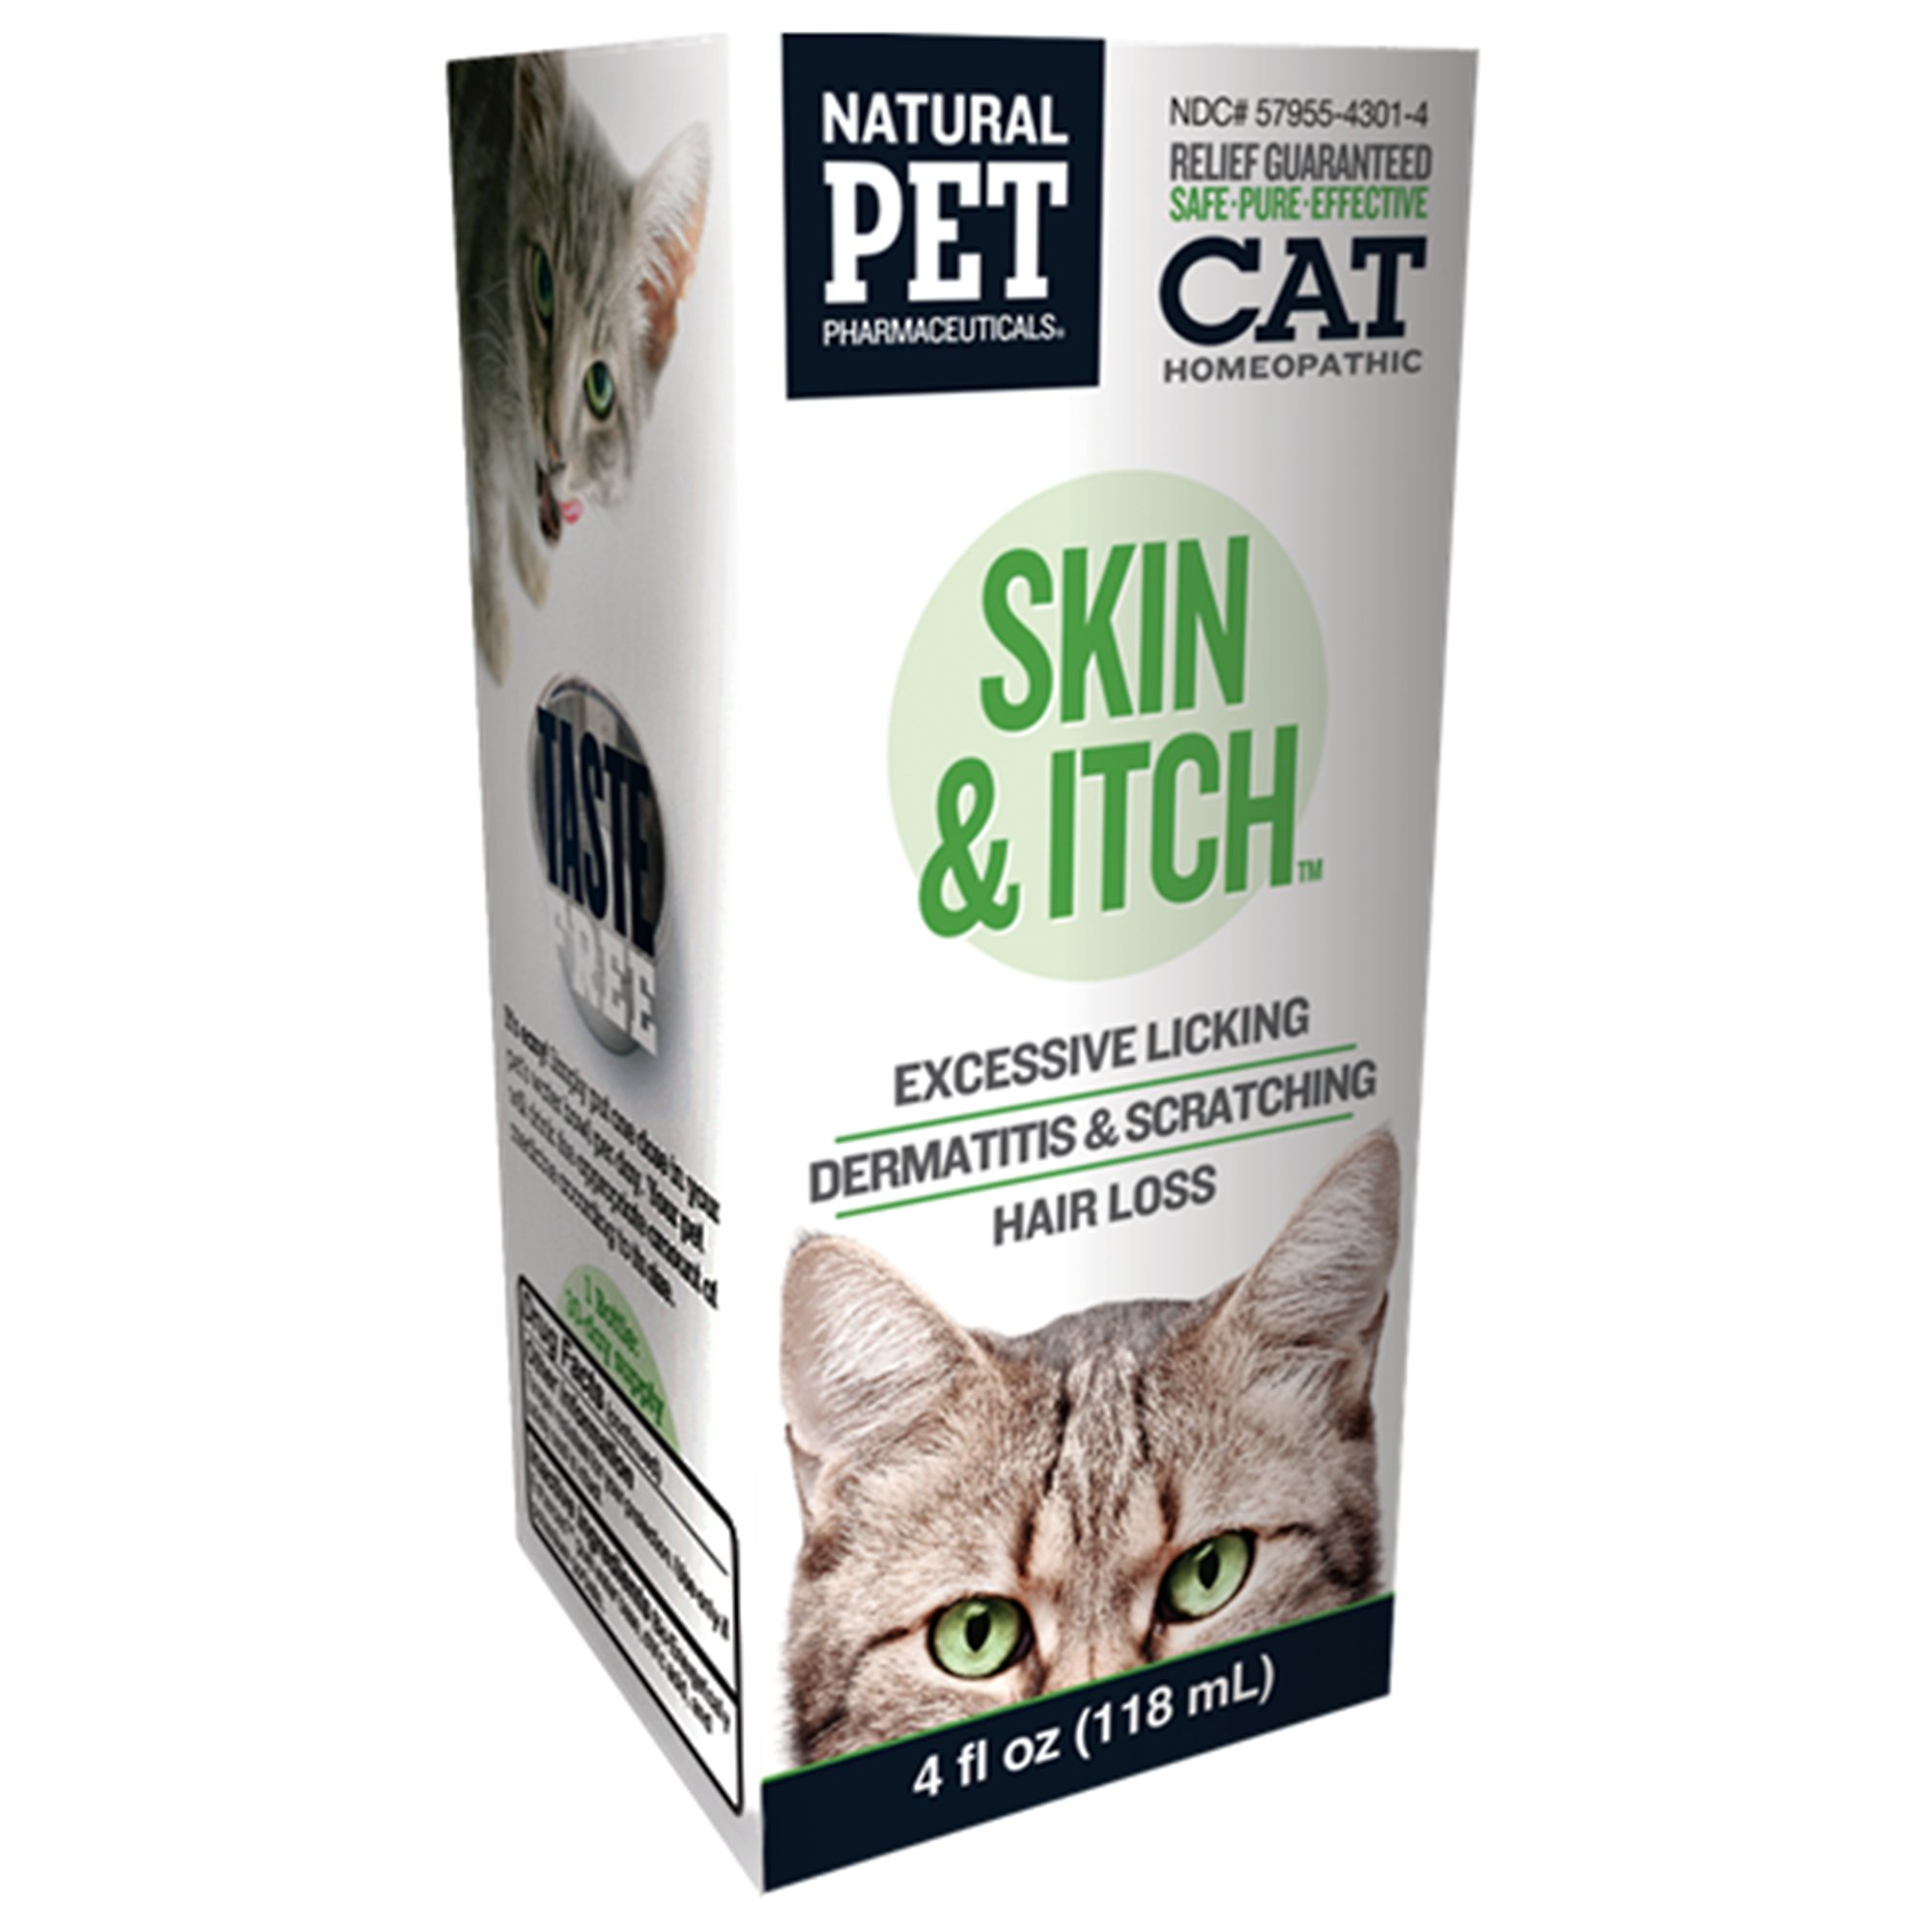 Natural Treatment Skin Irritation